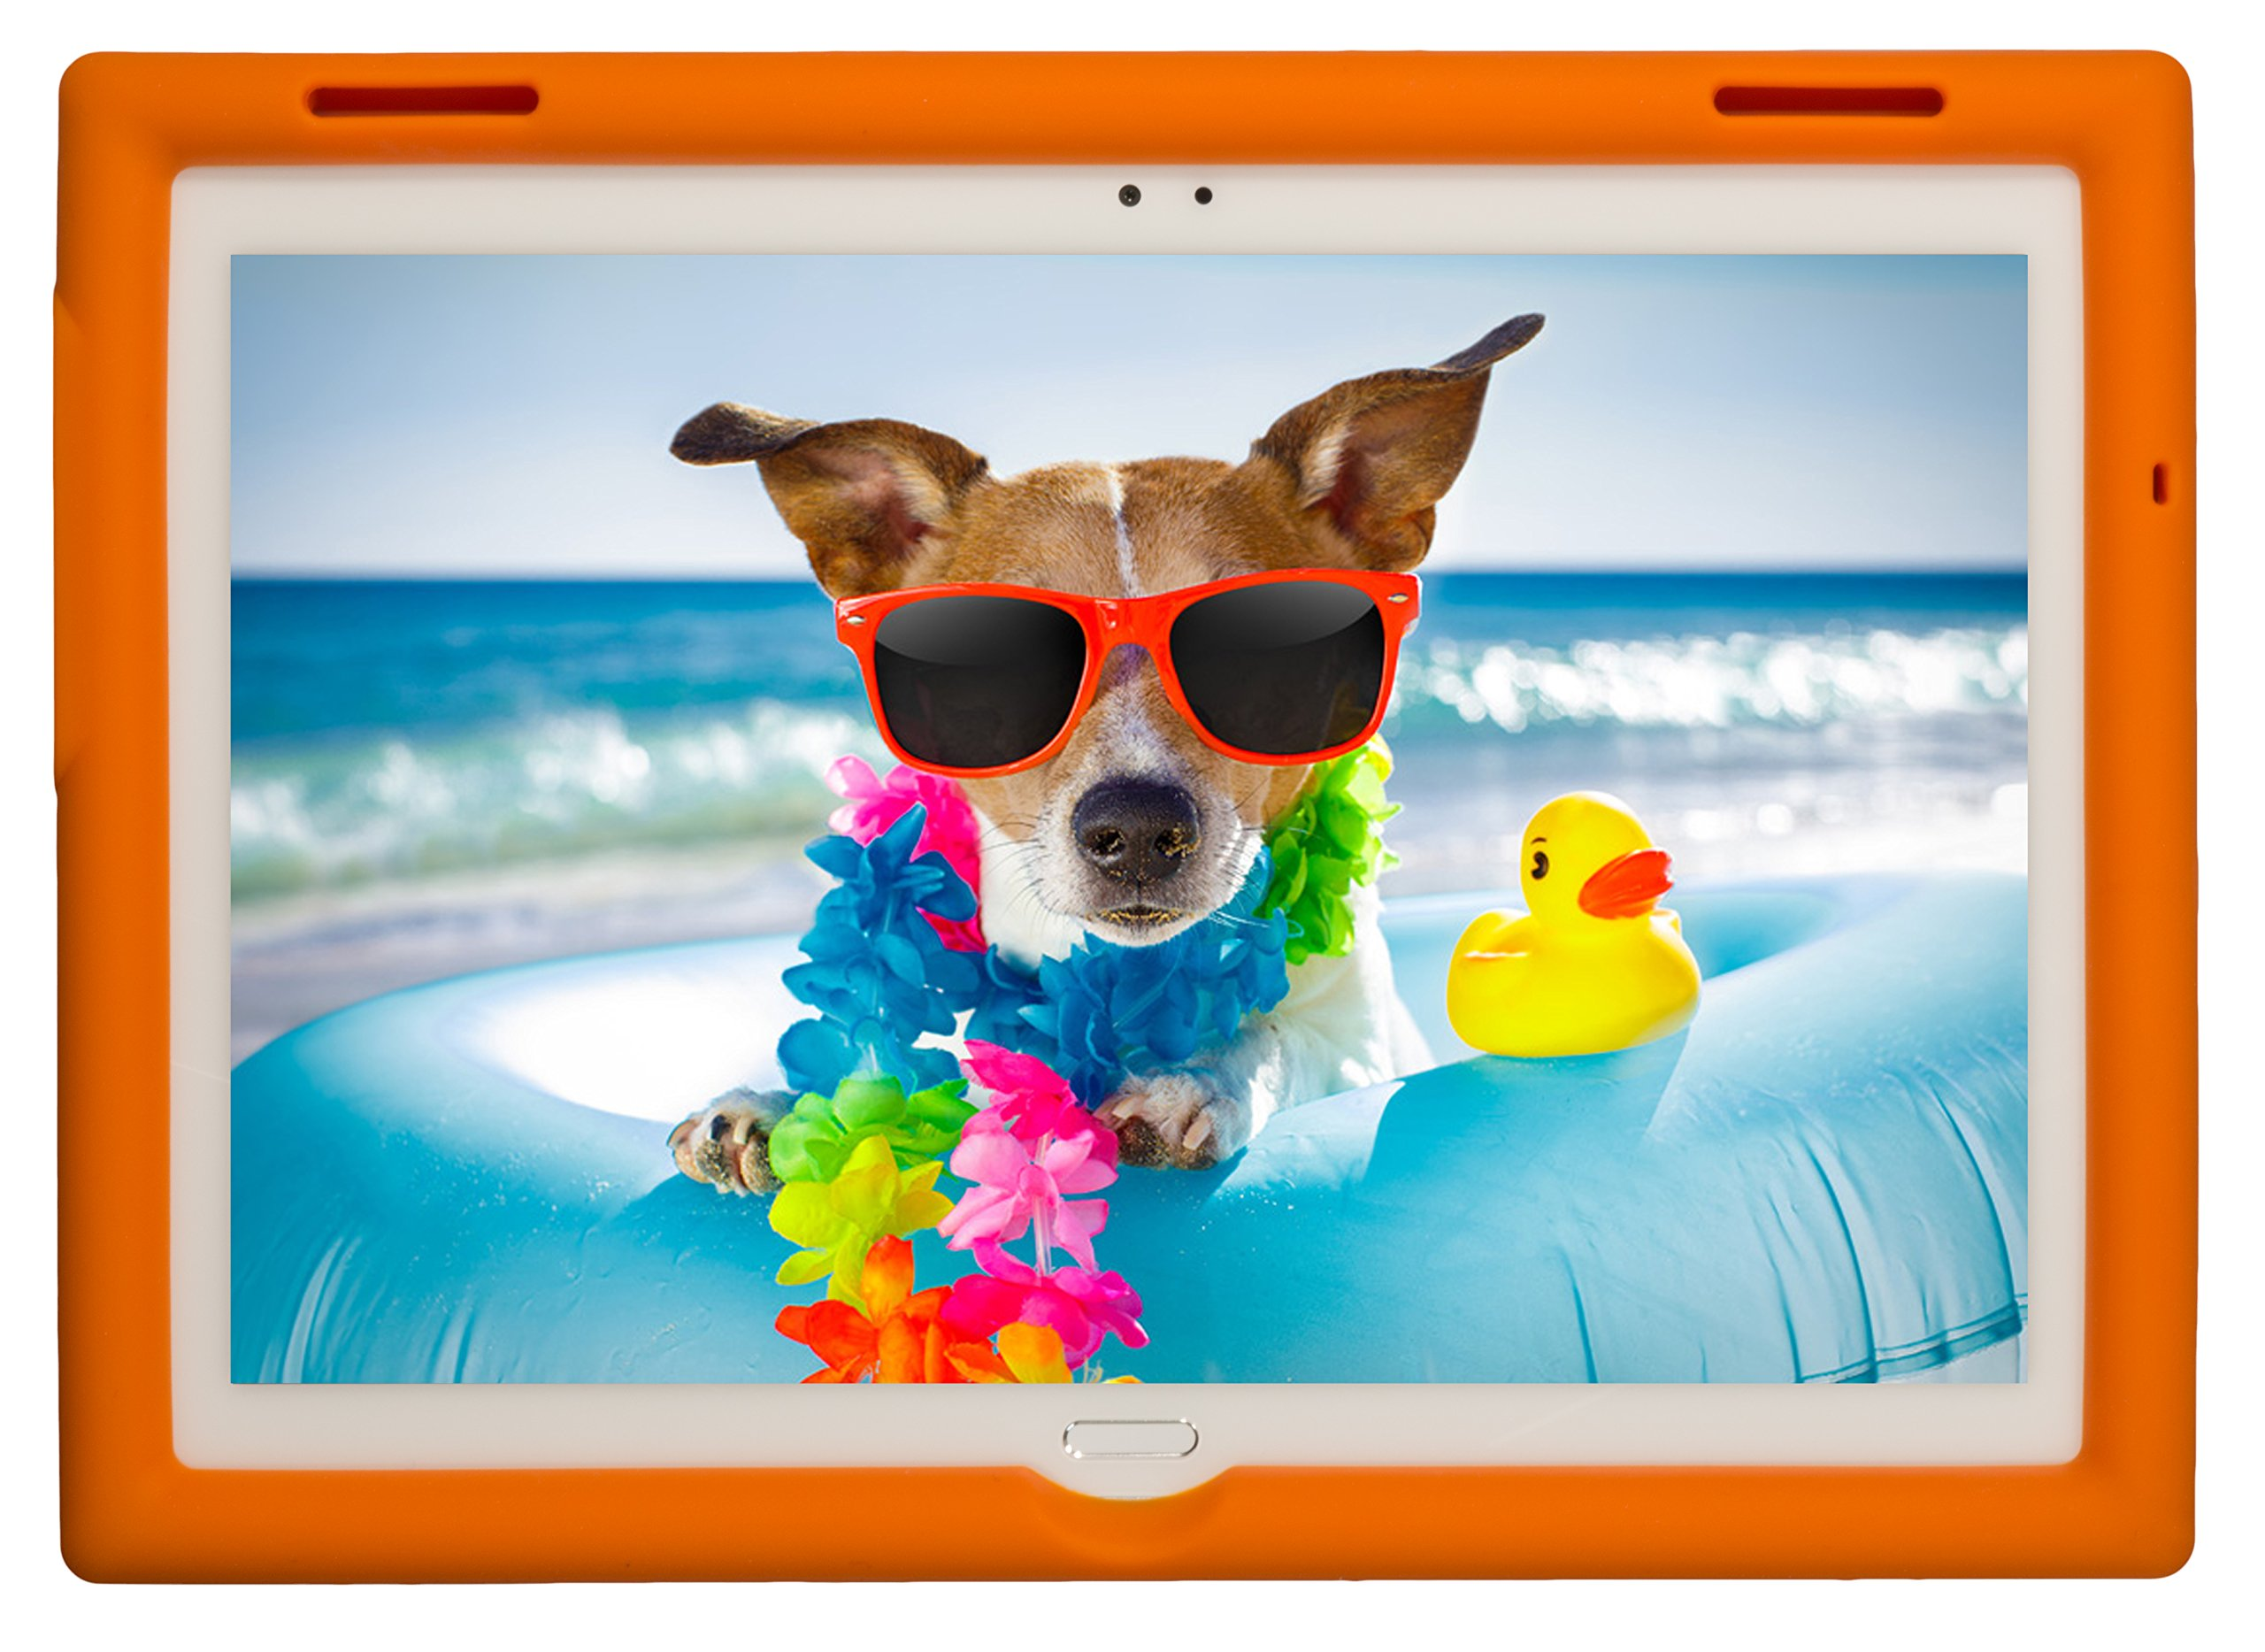 BobjGear Bobj Rugged Tablet Case for Lenovo Tab 4 10 Plus (TB-X704V, TB-X704F, TB-X704L, TB-X704Y, MotoTab TB-X704A) - BobjBounces Kid Friendly (Outrageous Orange)